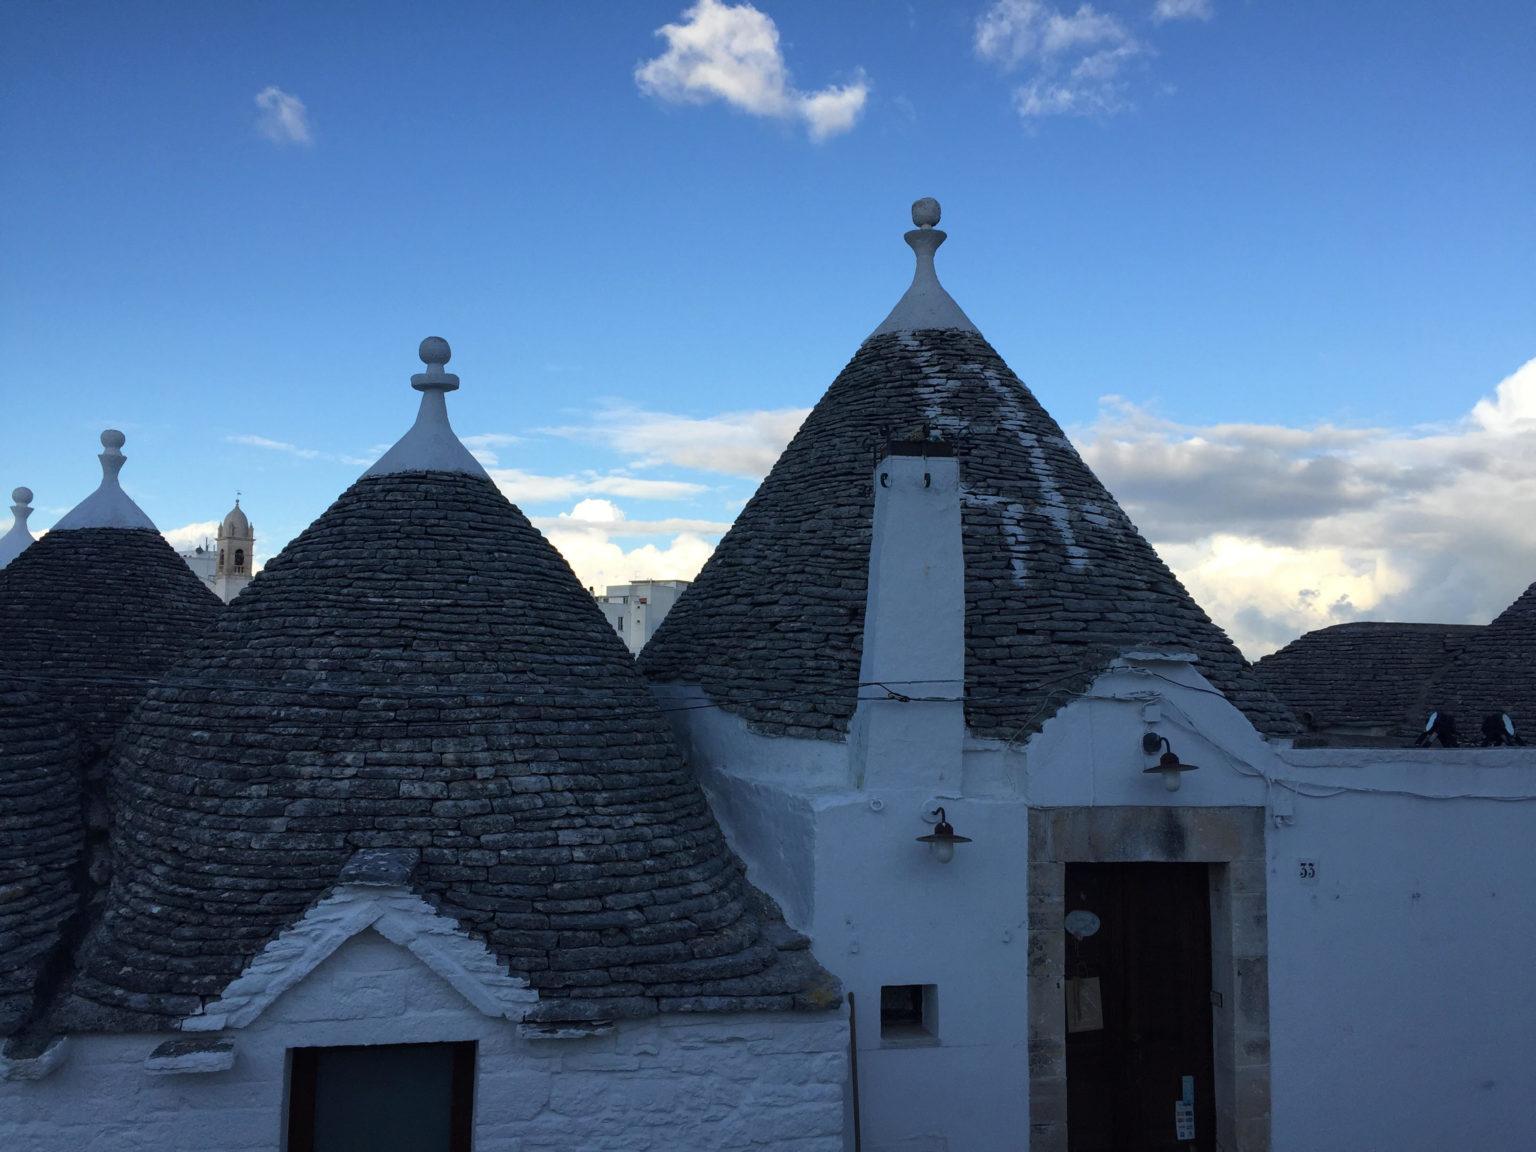 The Best of Alberobello Walking Tour and Rosolio Tasting